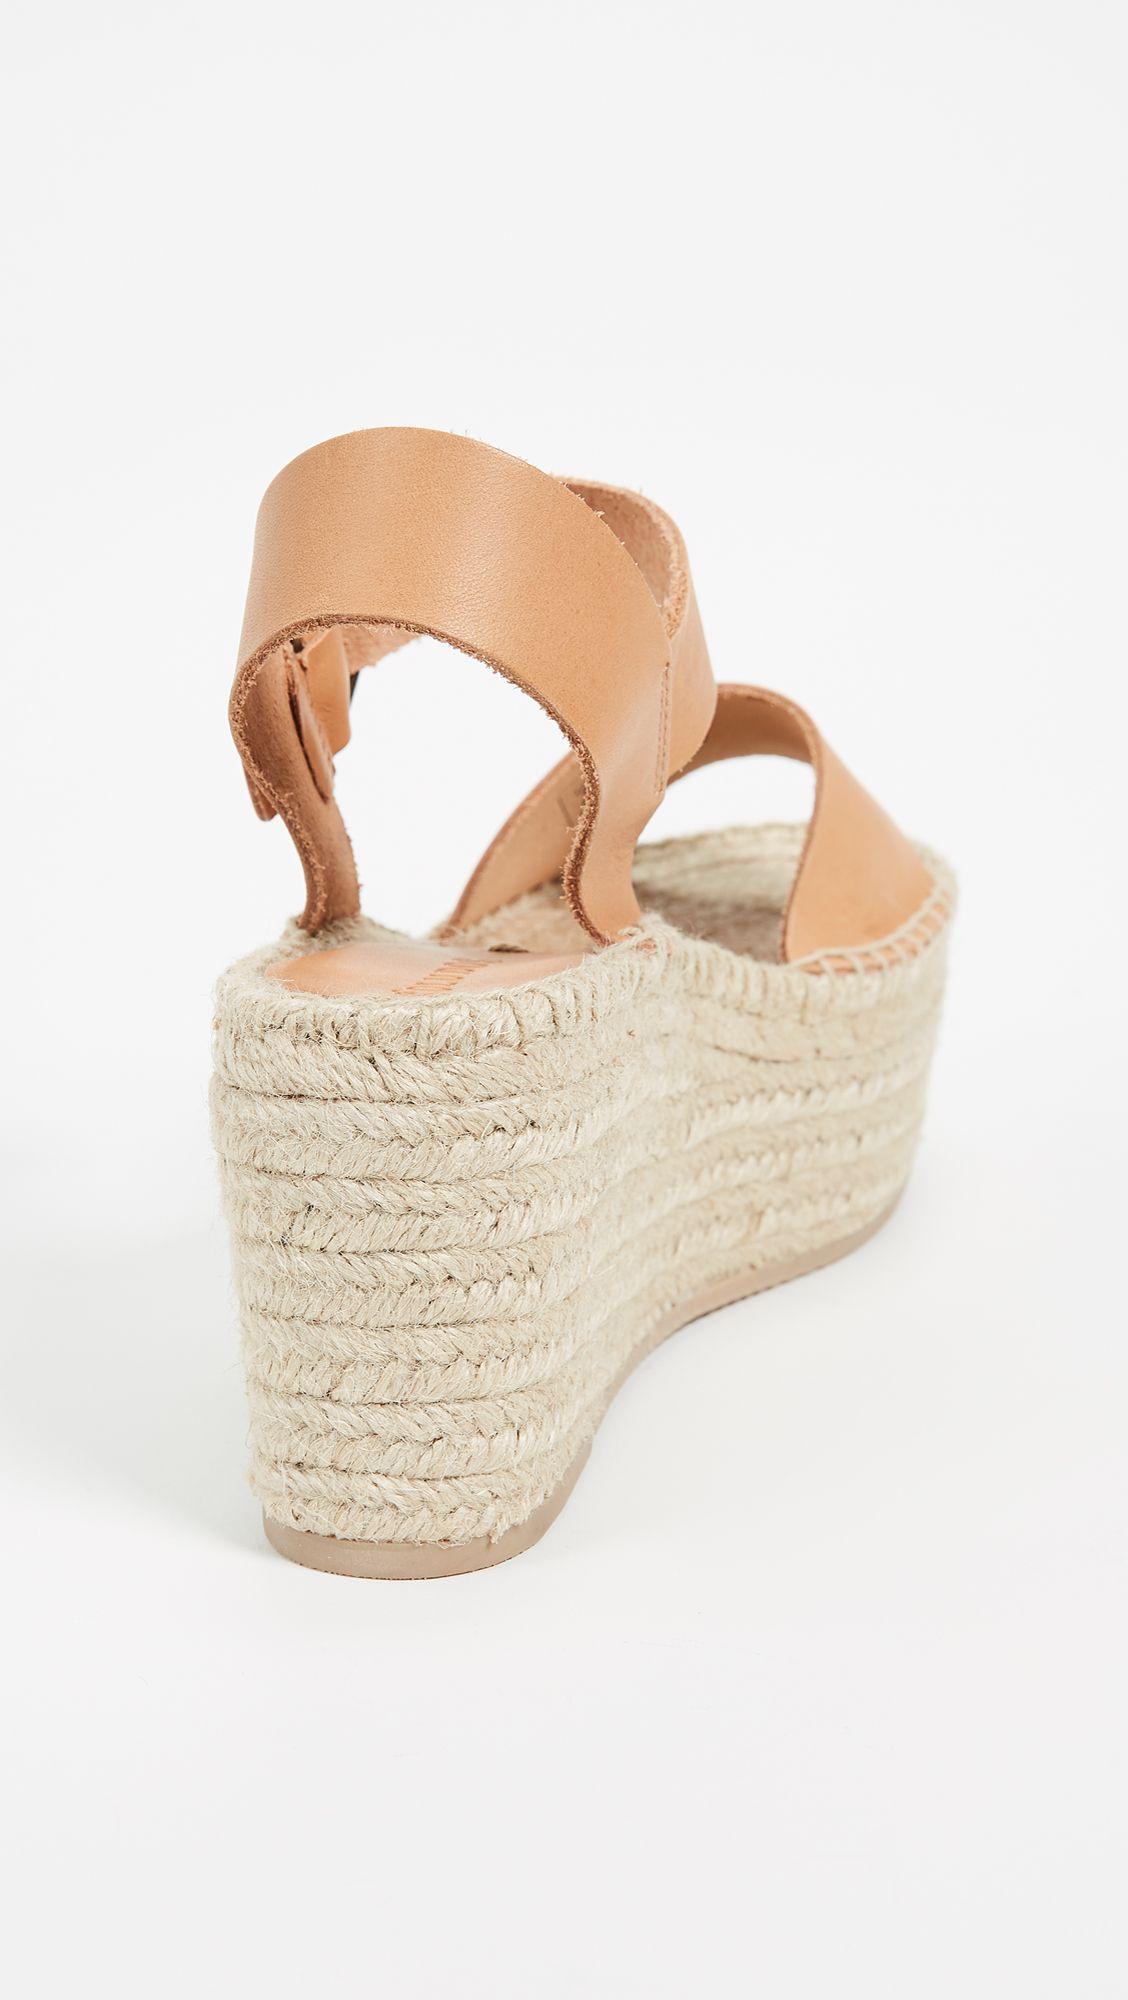 ed7598ed050 Soludos Minorca High Platform Sandals